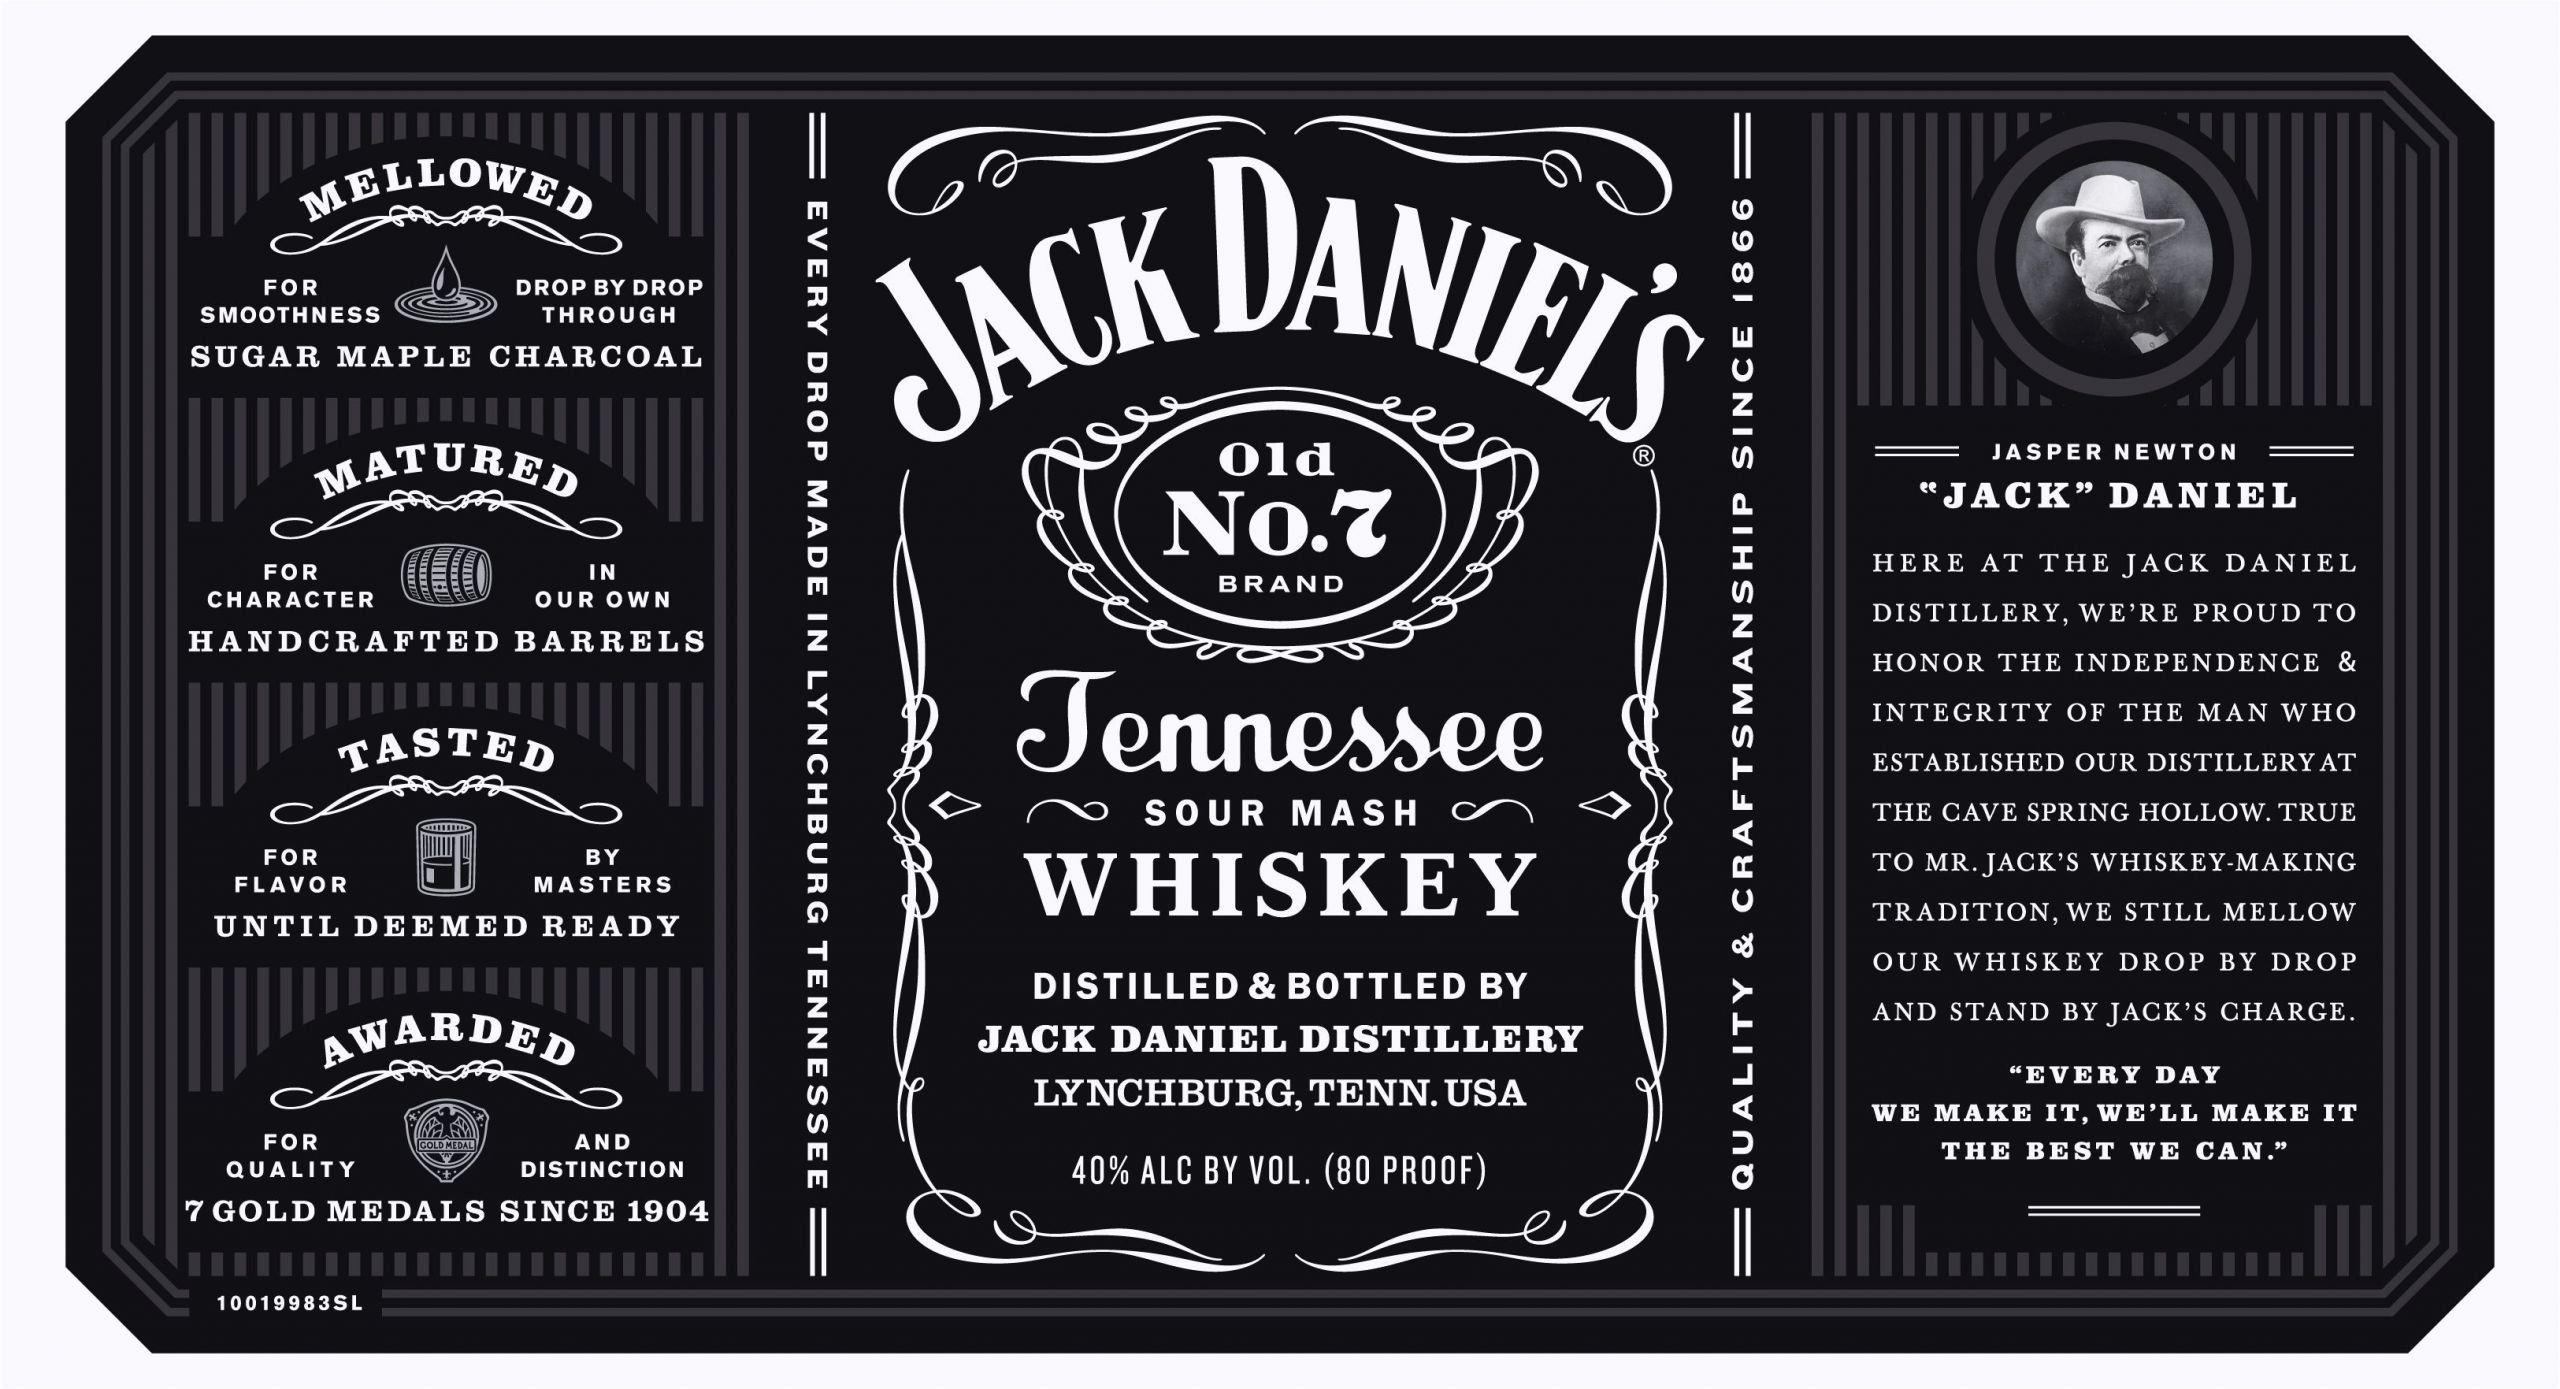 Jack Daniels Label Template Fresh Jack Daniels Etikett Vorlage Elegant Jack Daniels Label Templates Jack Daniels Bottle Label Template